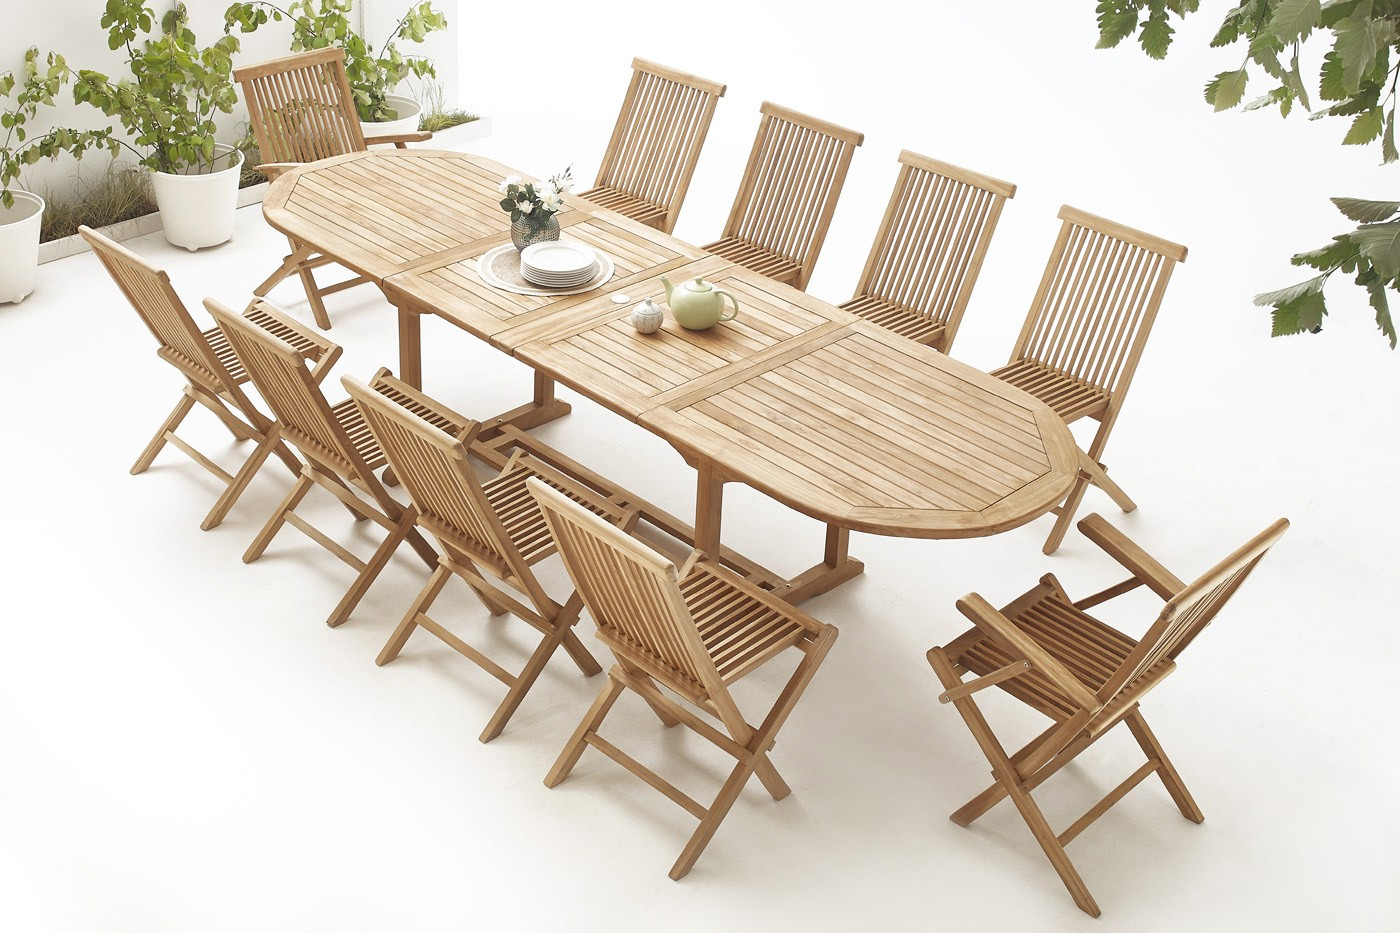 Table ovale 8 chaises 2 fauteuils teck brut massif for Table exterieur ovale